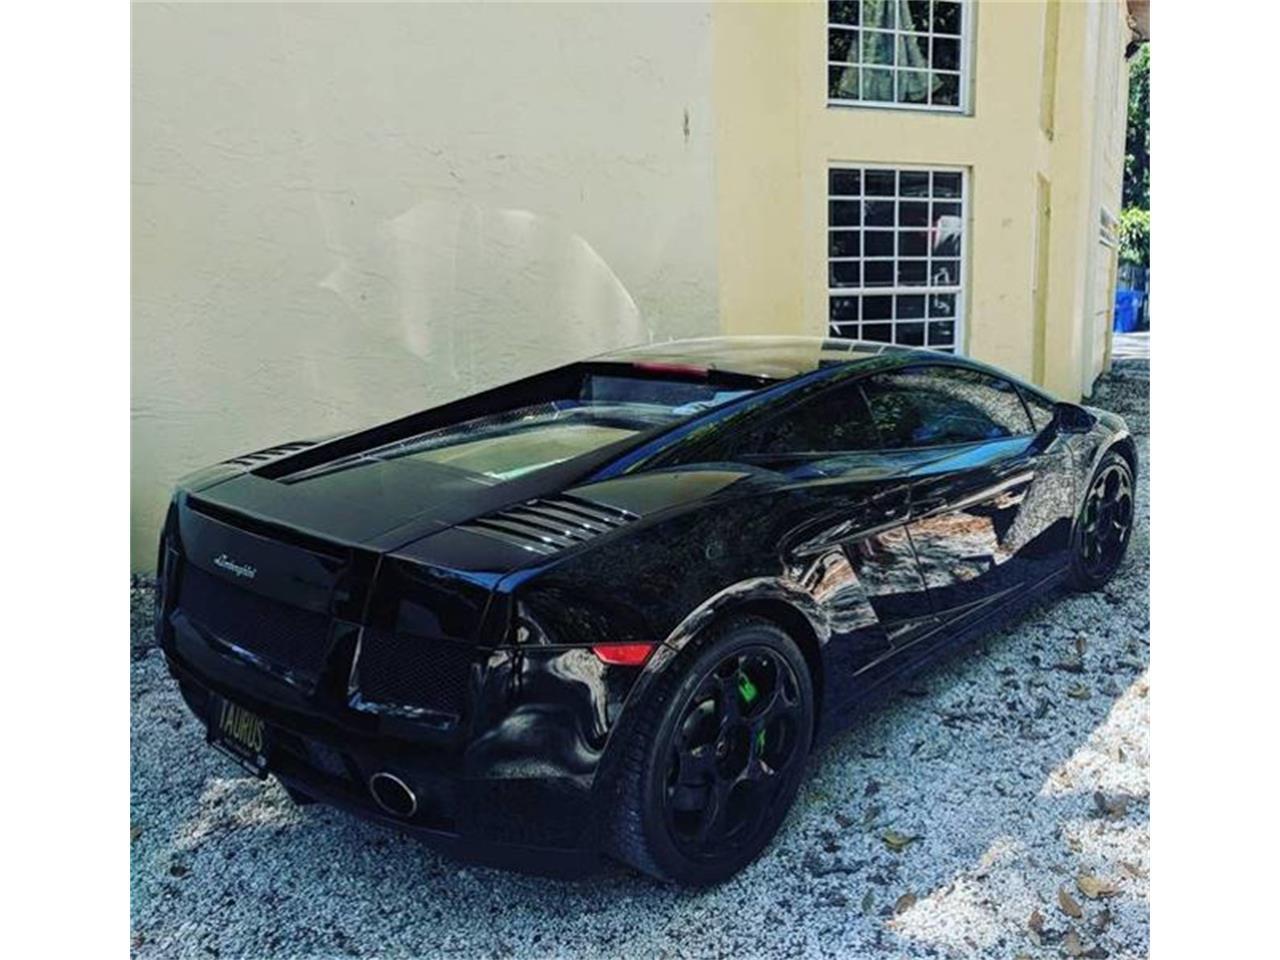 Large Picture of 2004 Lamborghini Gallardo located in Long Island New York - $135,000.00 - QWAO